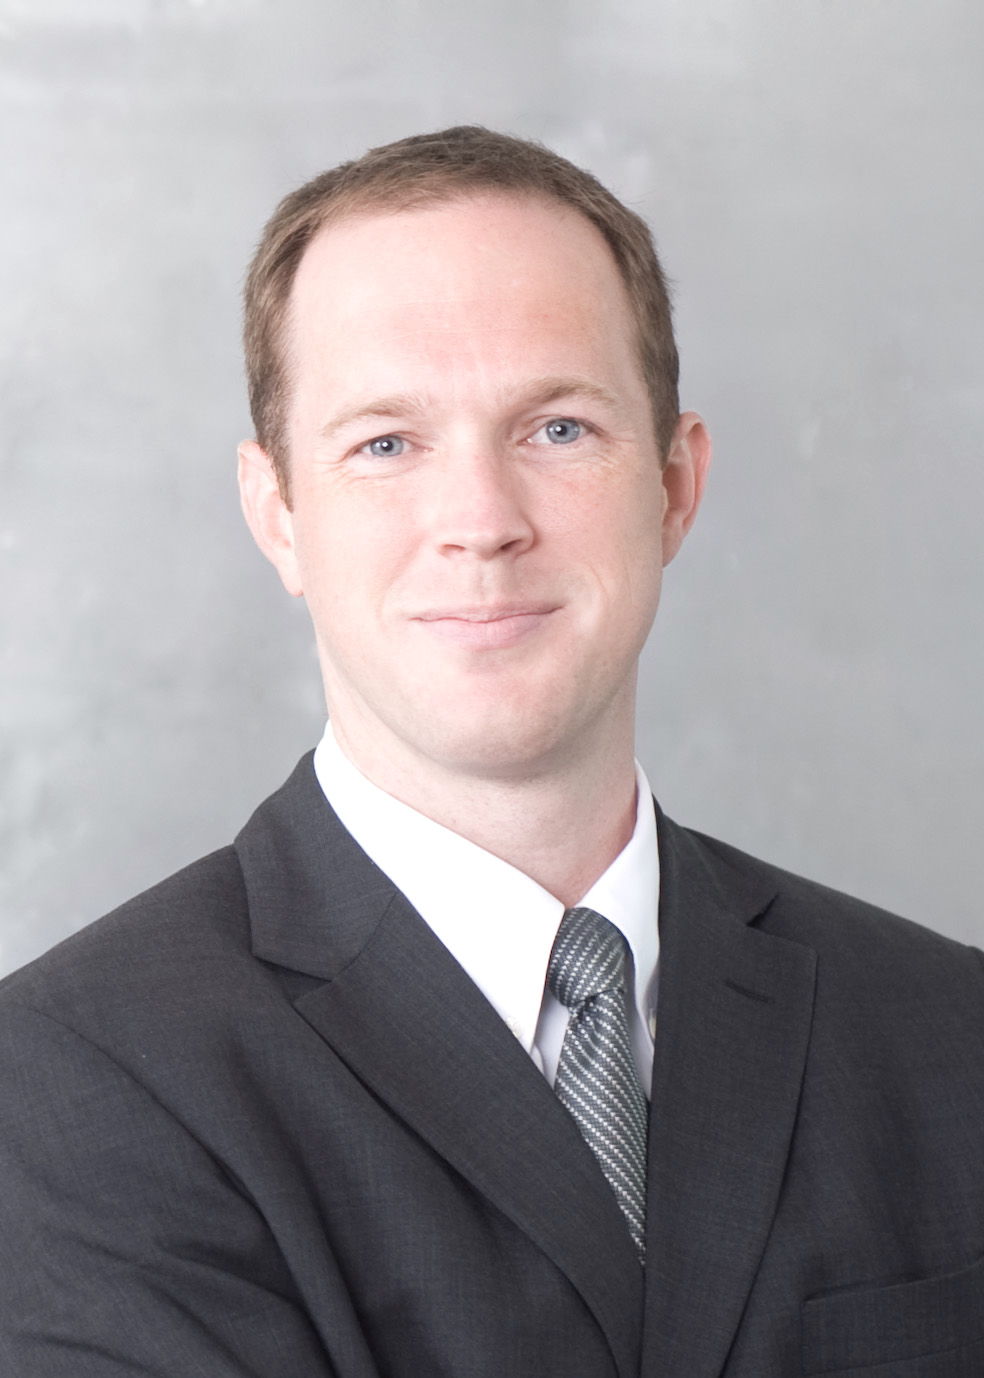 Bradley R. Hightower